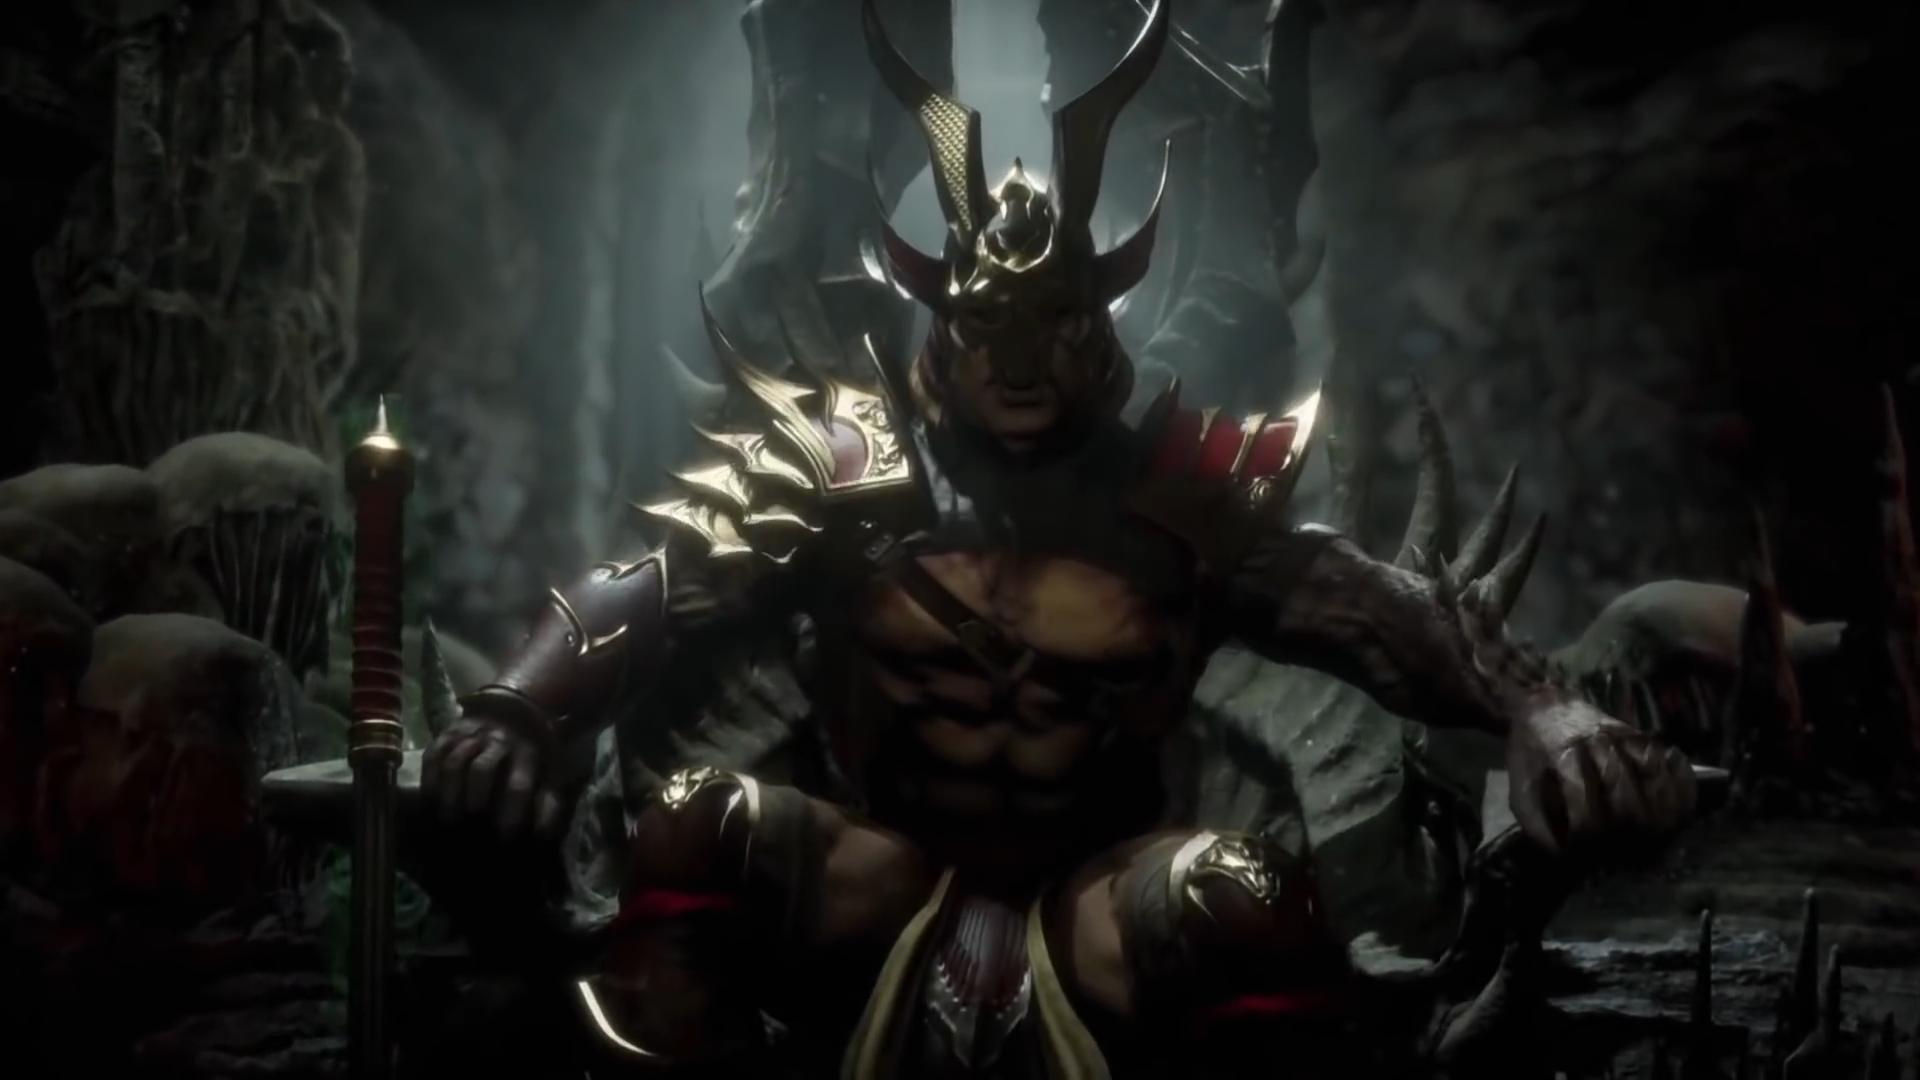 IMG_20190121_193757.058.jpg - Mortal Kombat 11